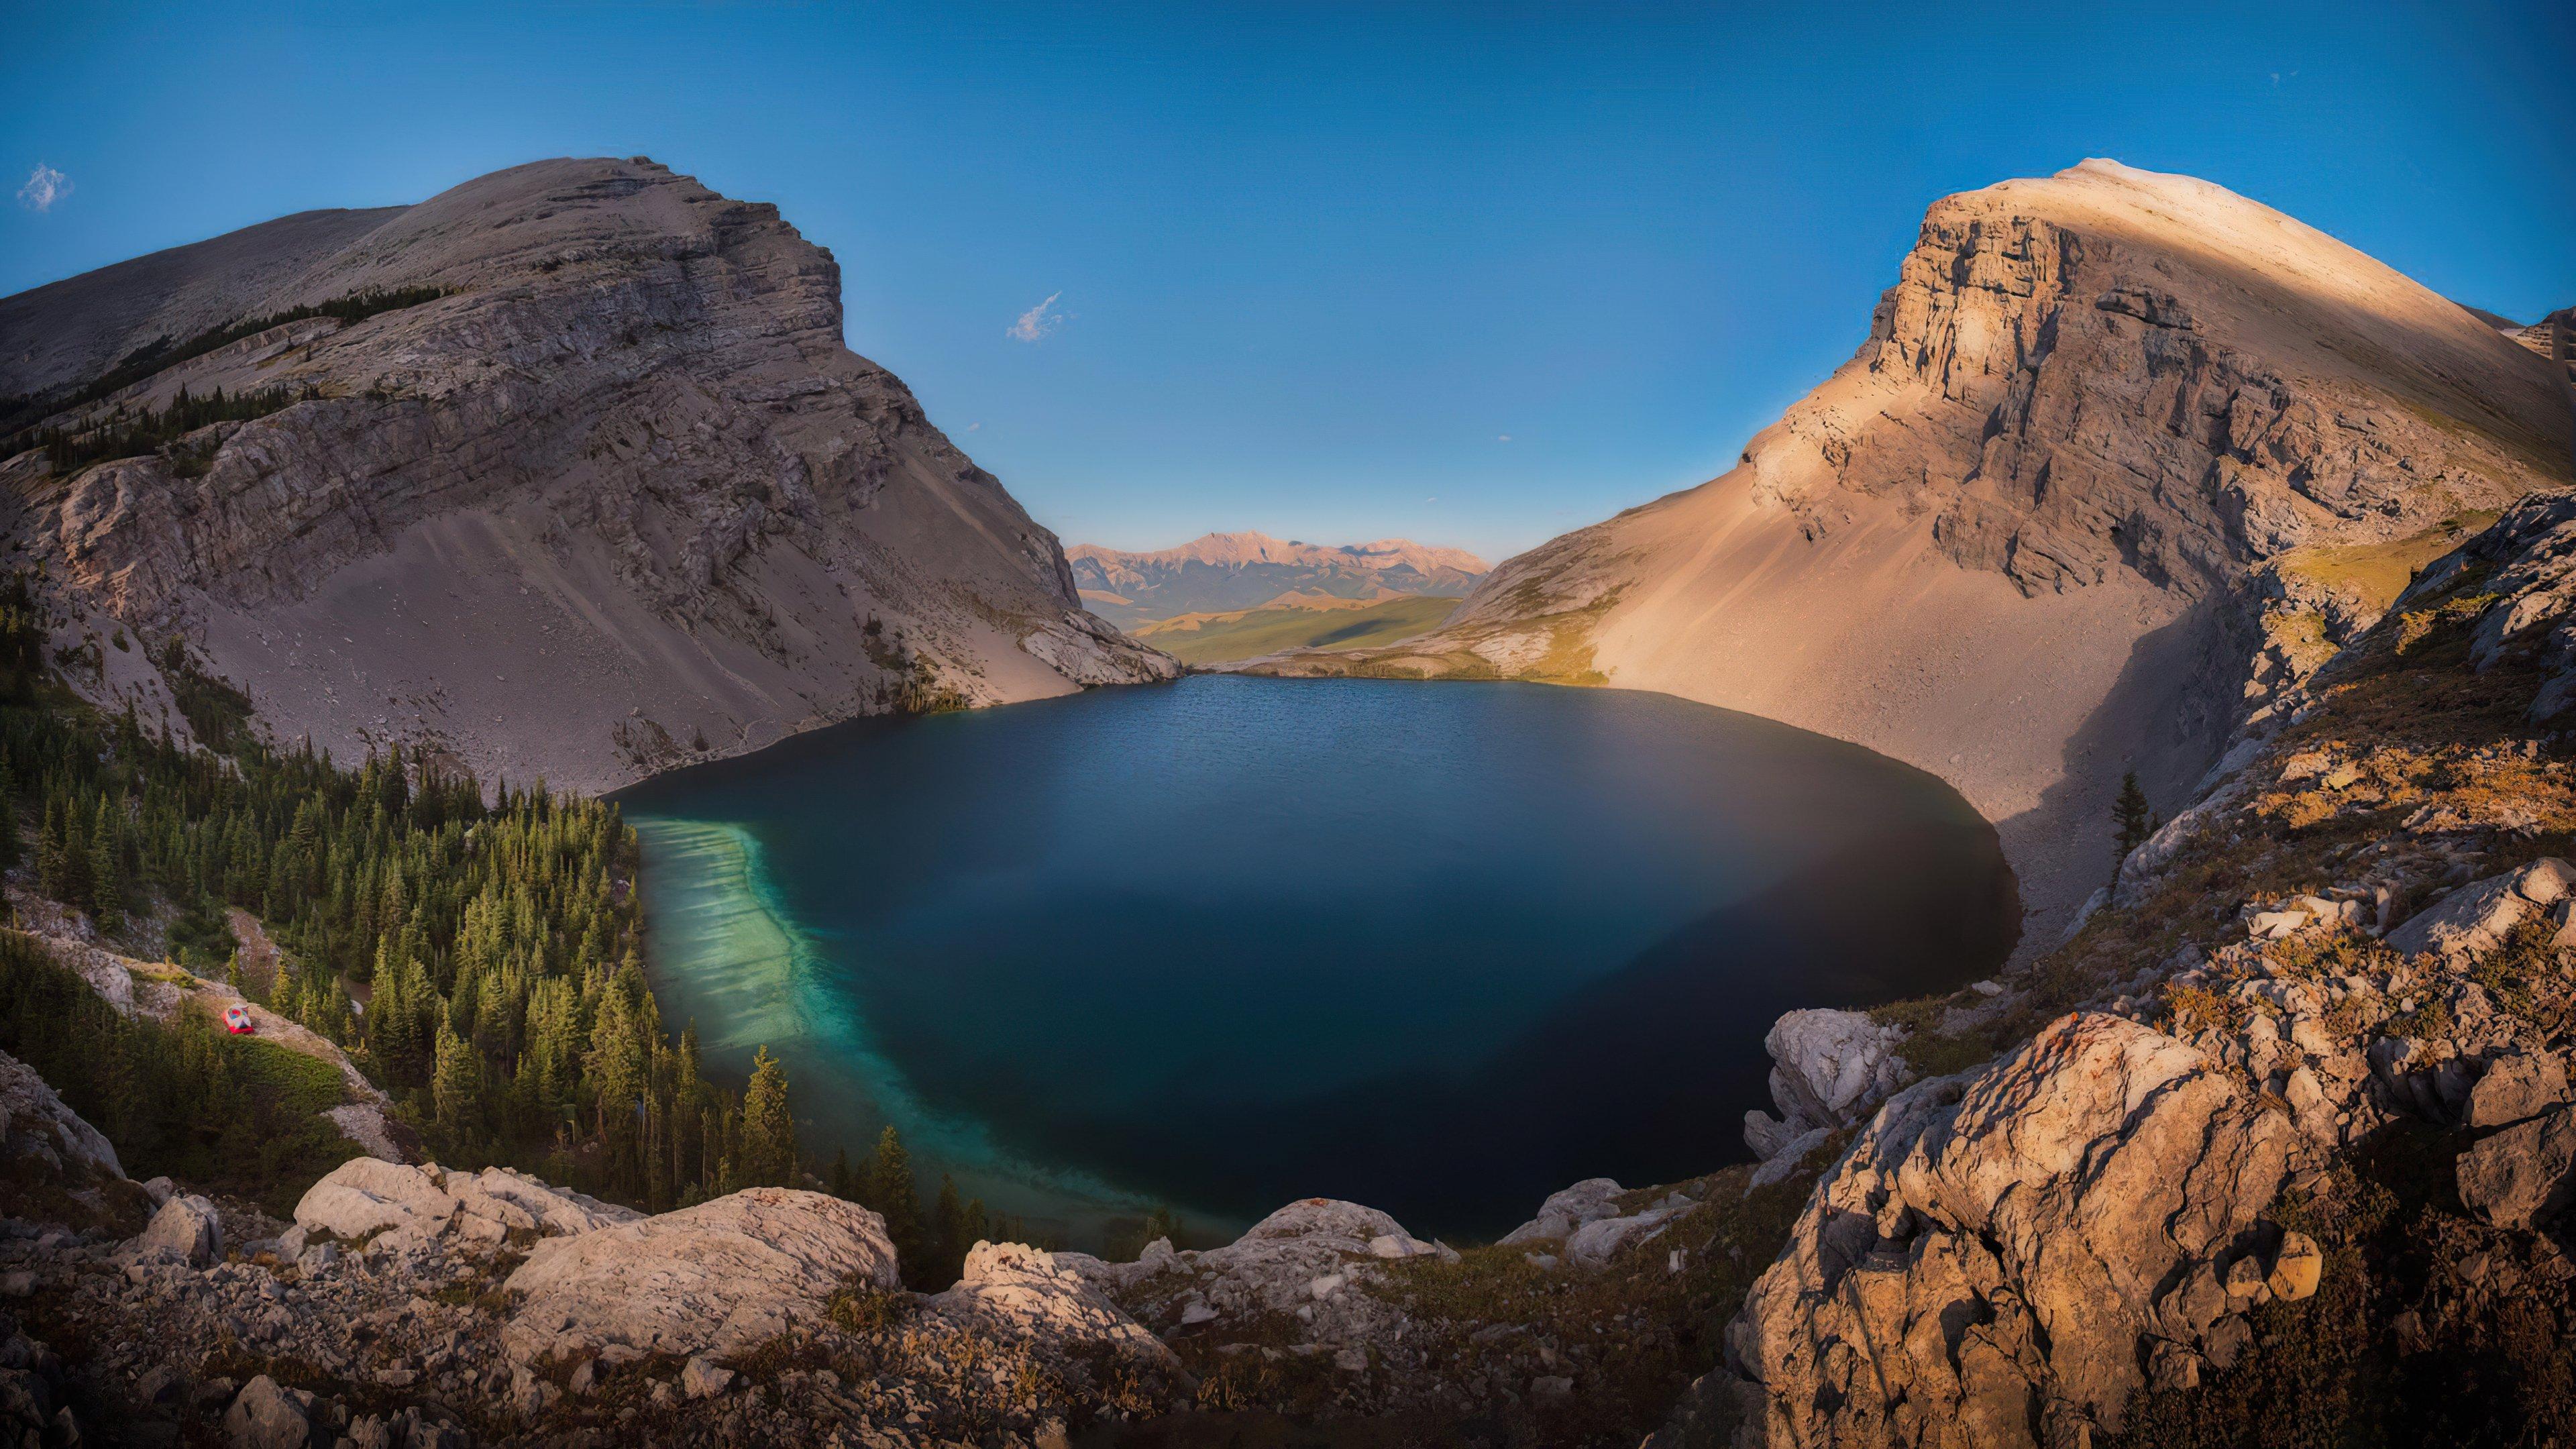 Fondos de pantalla Lago Carnavron en Kananaskis Alberta